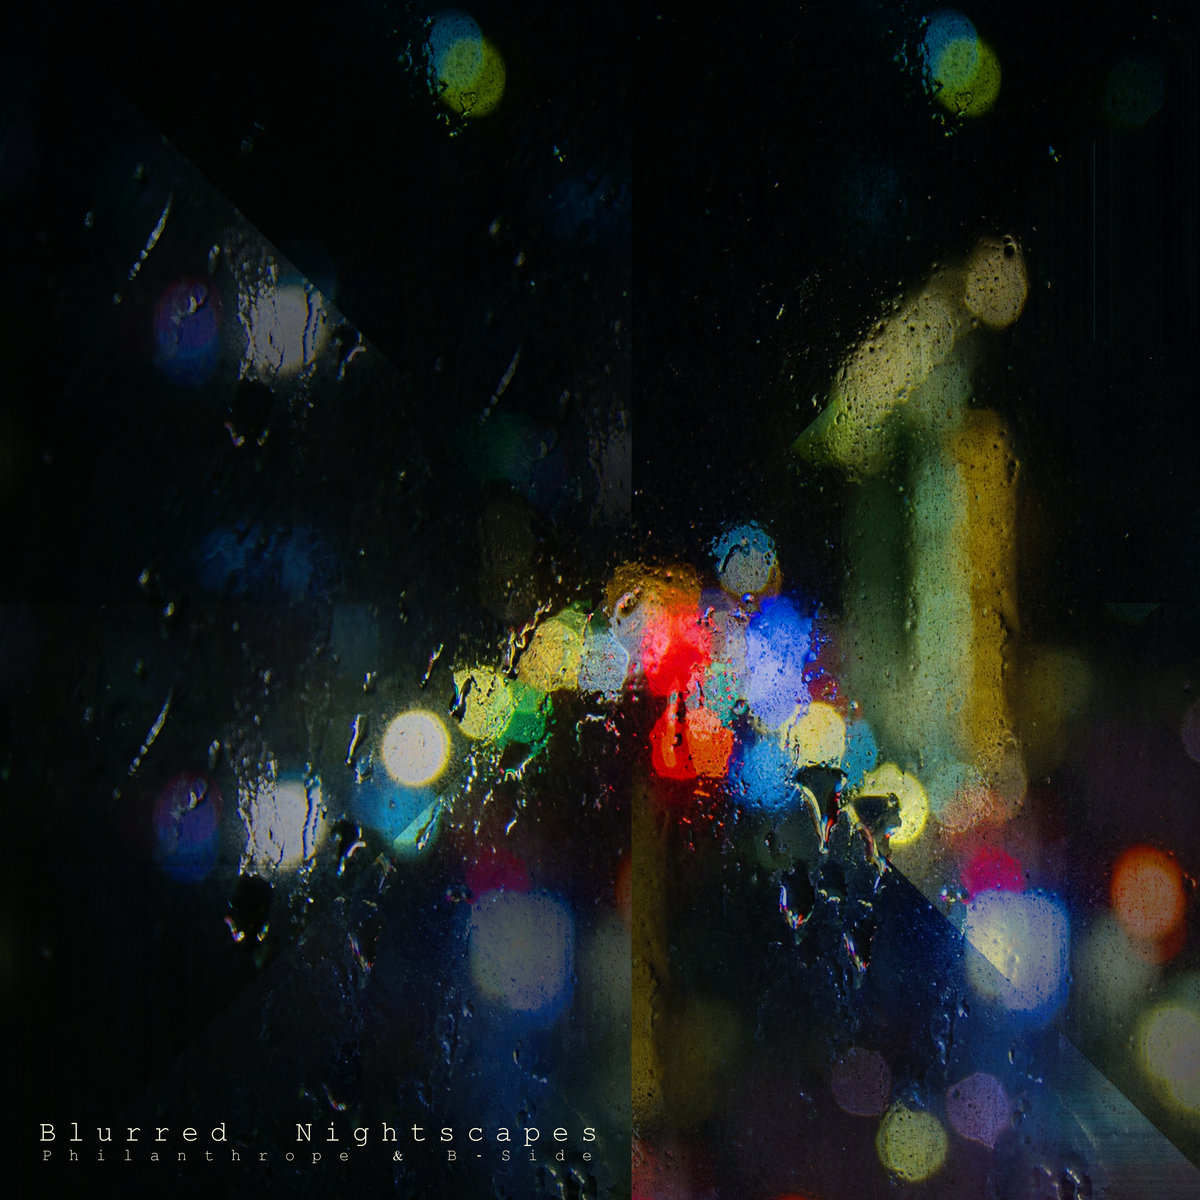 blurred nightscapes dezi belle